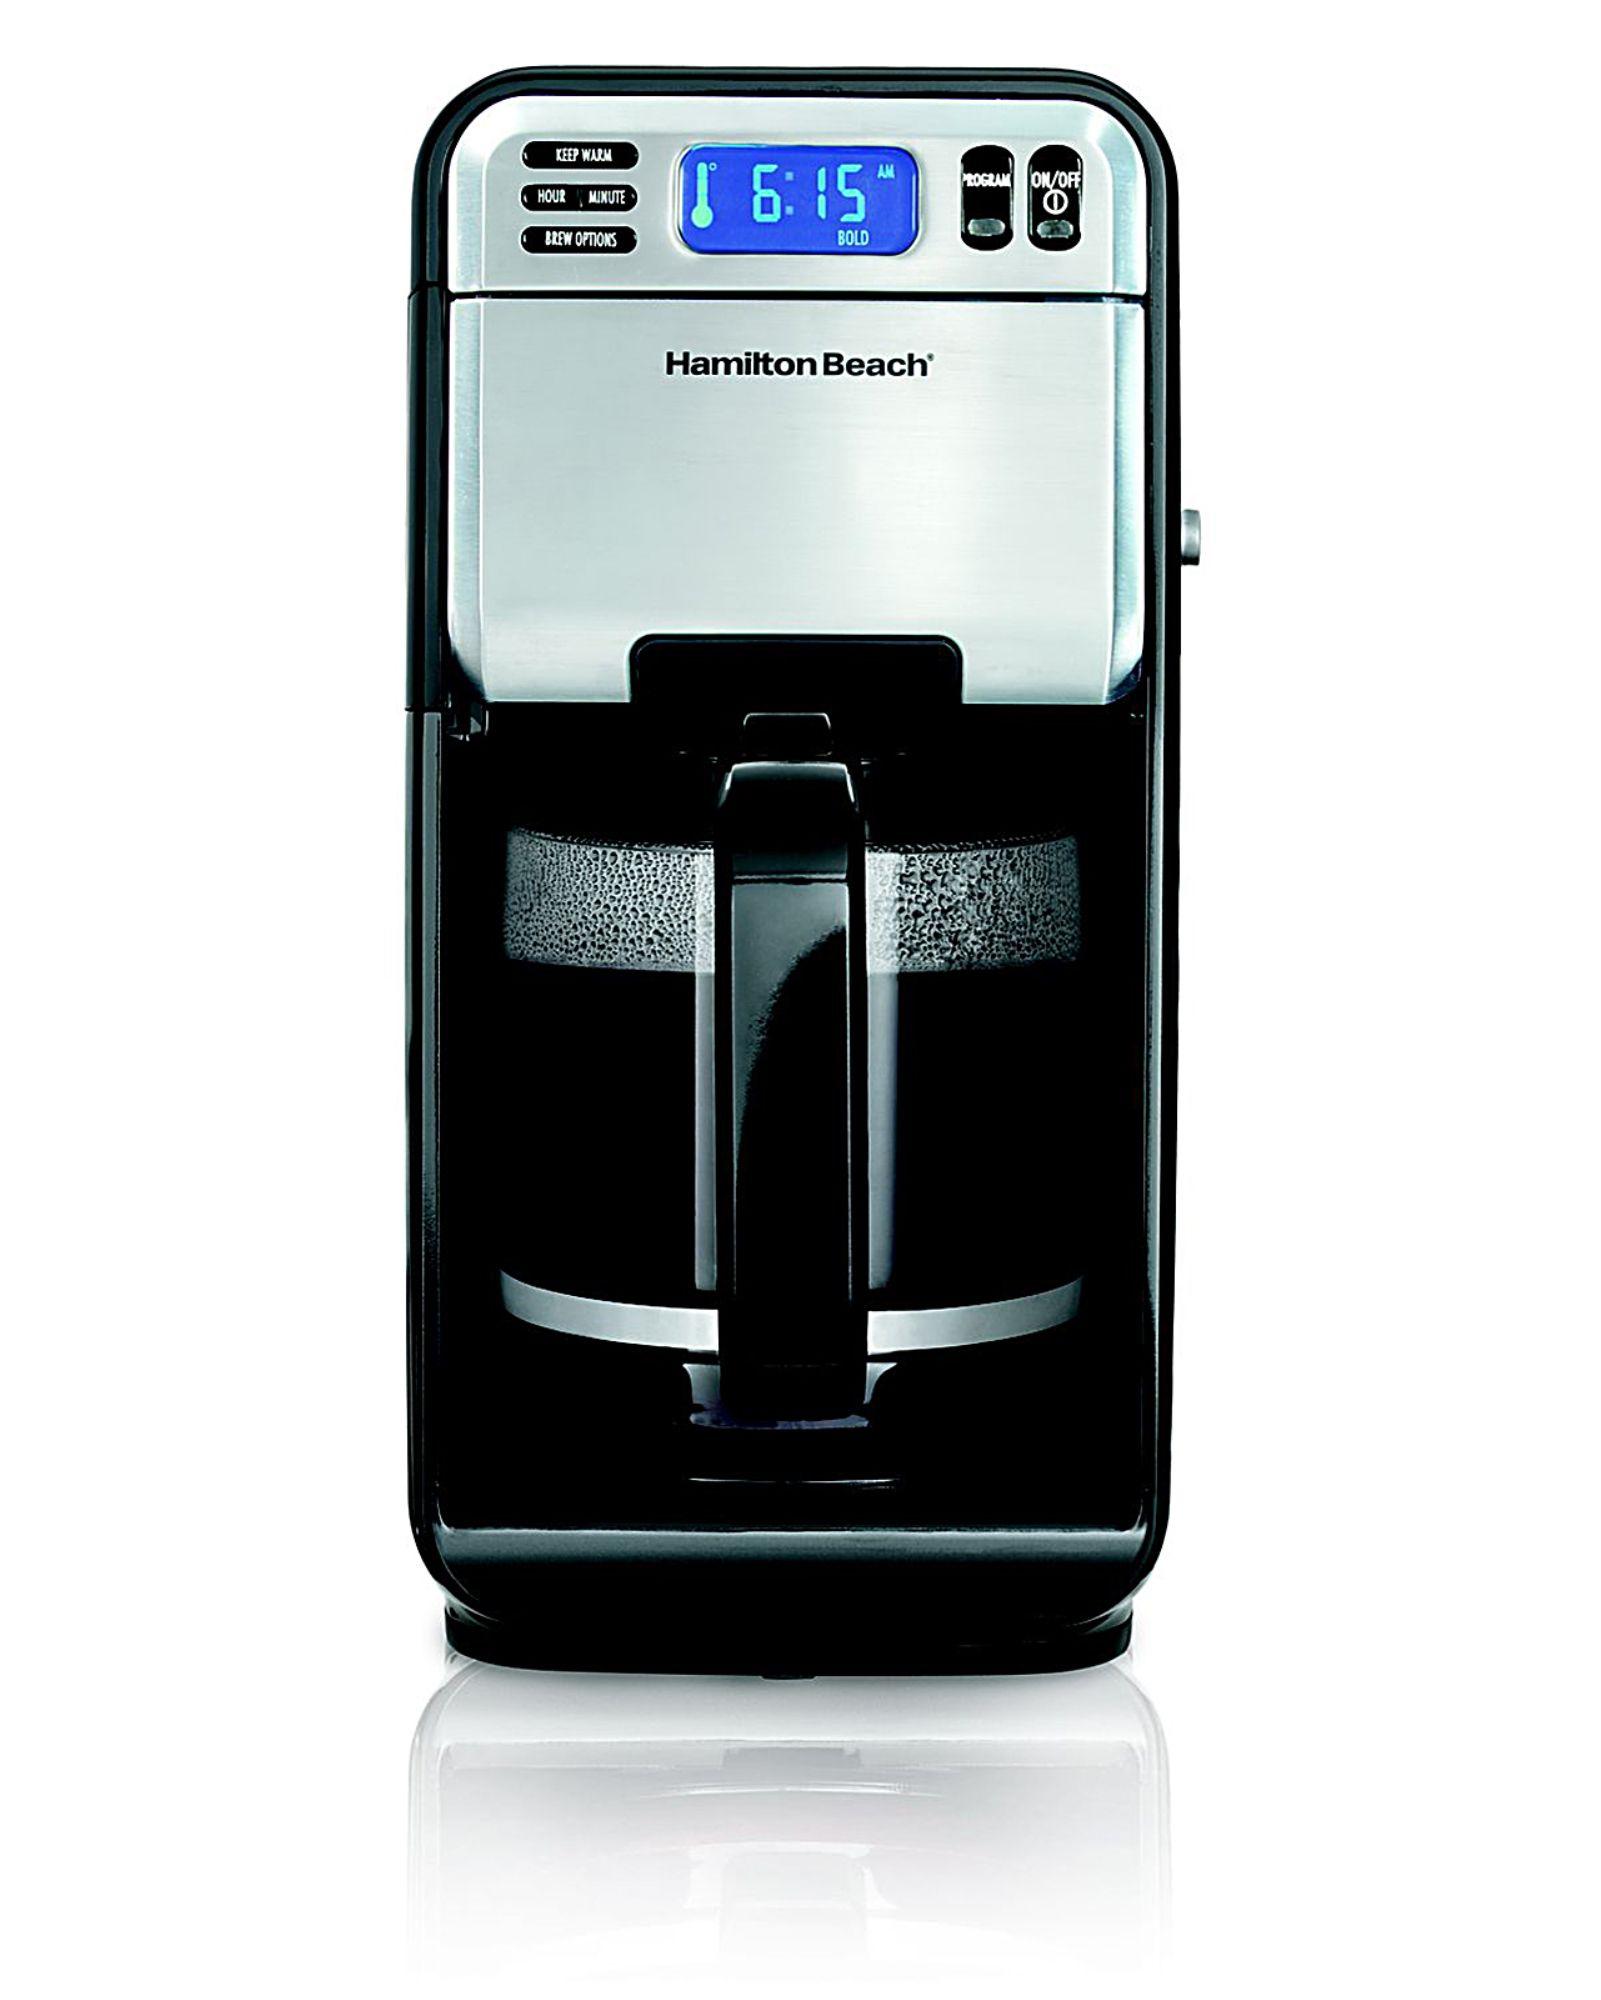 Hamilton Beach Brands Inc. 12Cup Programmable Coffeemaker